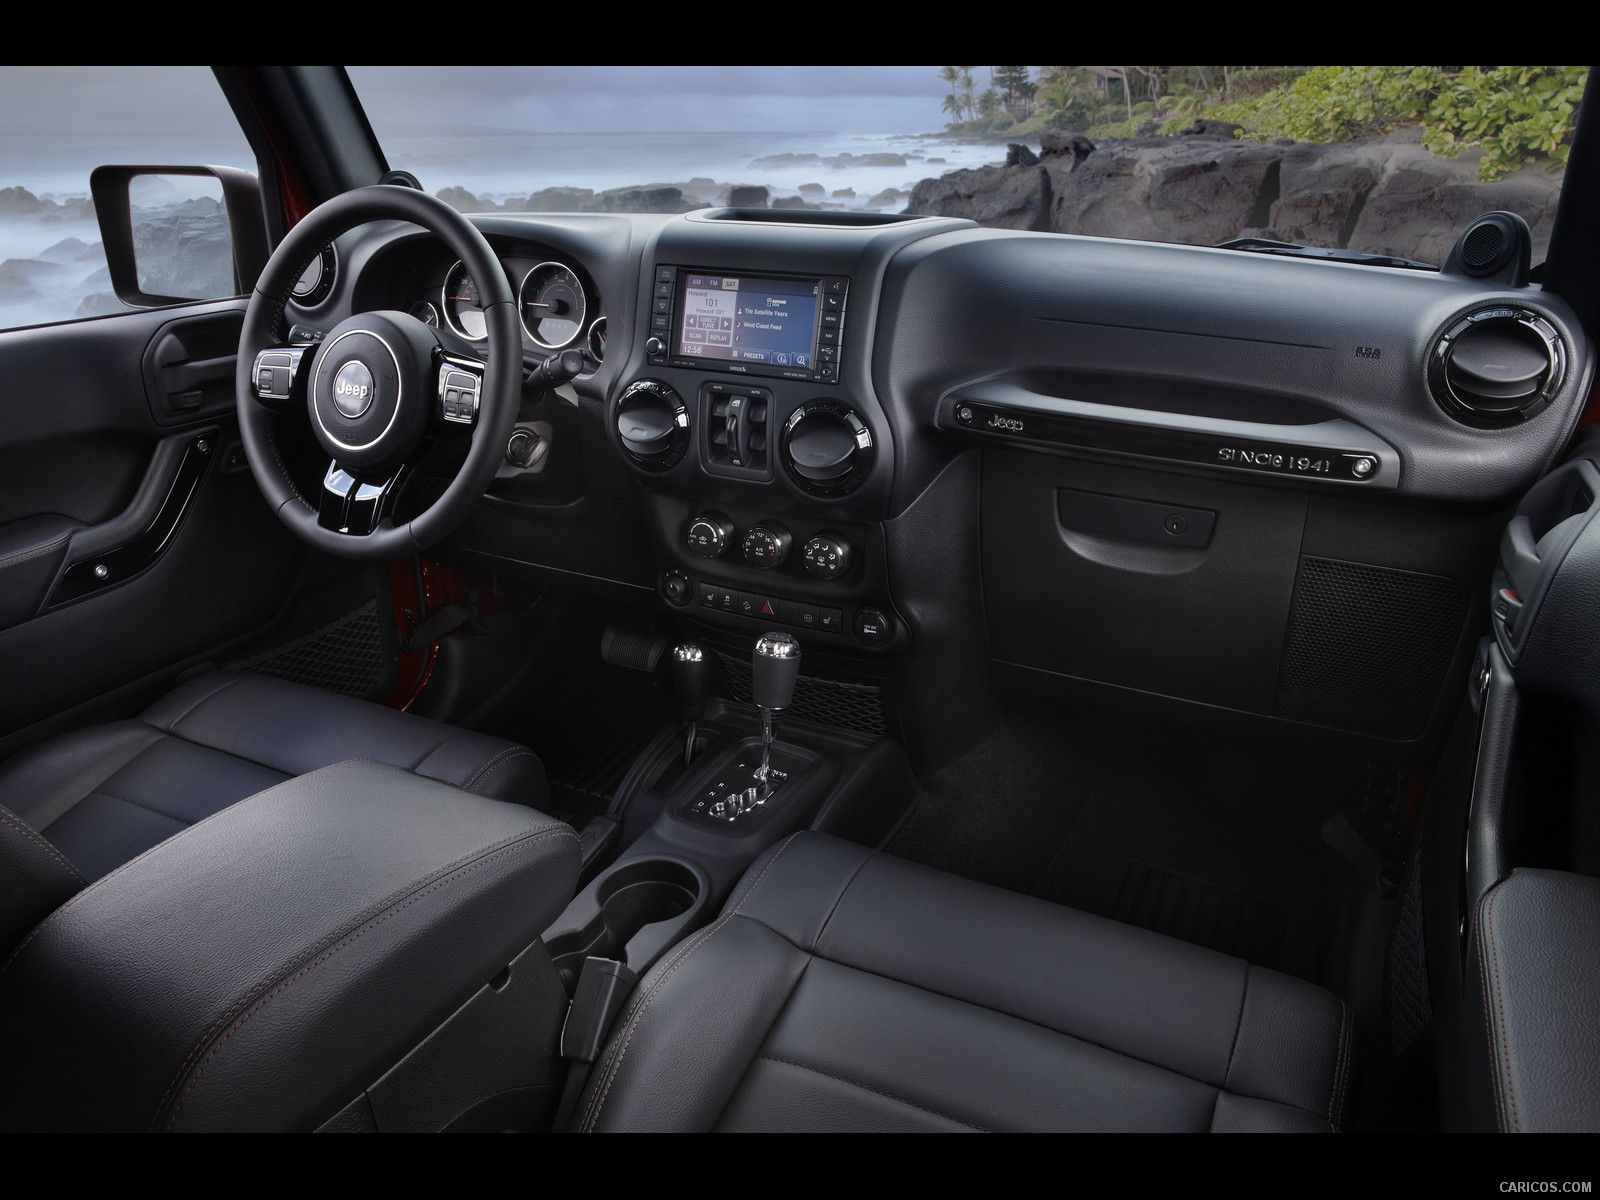 2013 Jeep Wrangler Unlimited Altitude Interior Wallpaper 7 Design 1600x1200 Pixel Inspiration